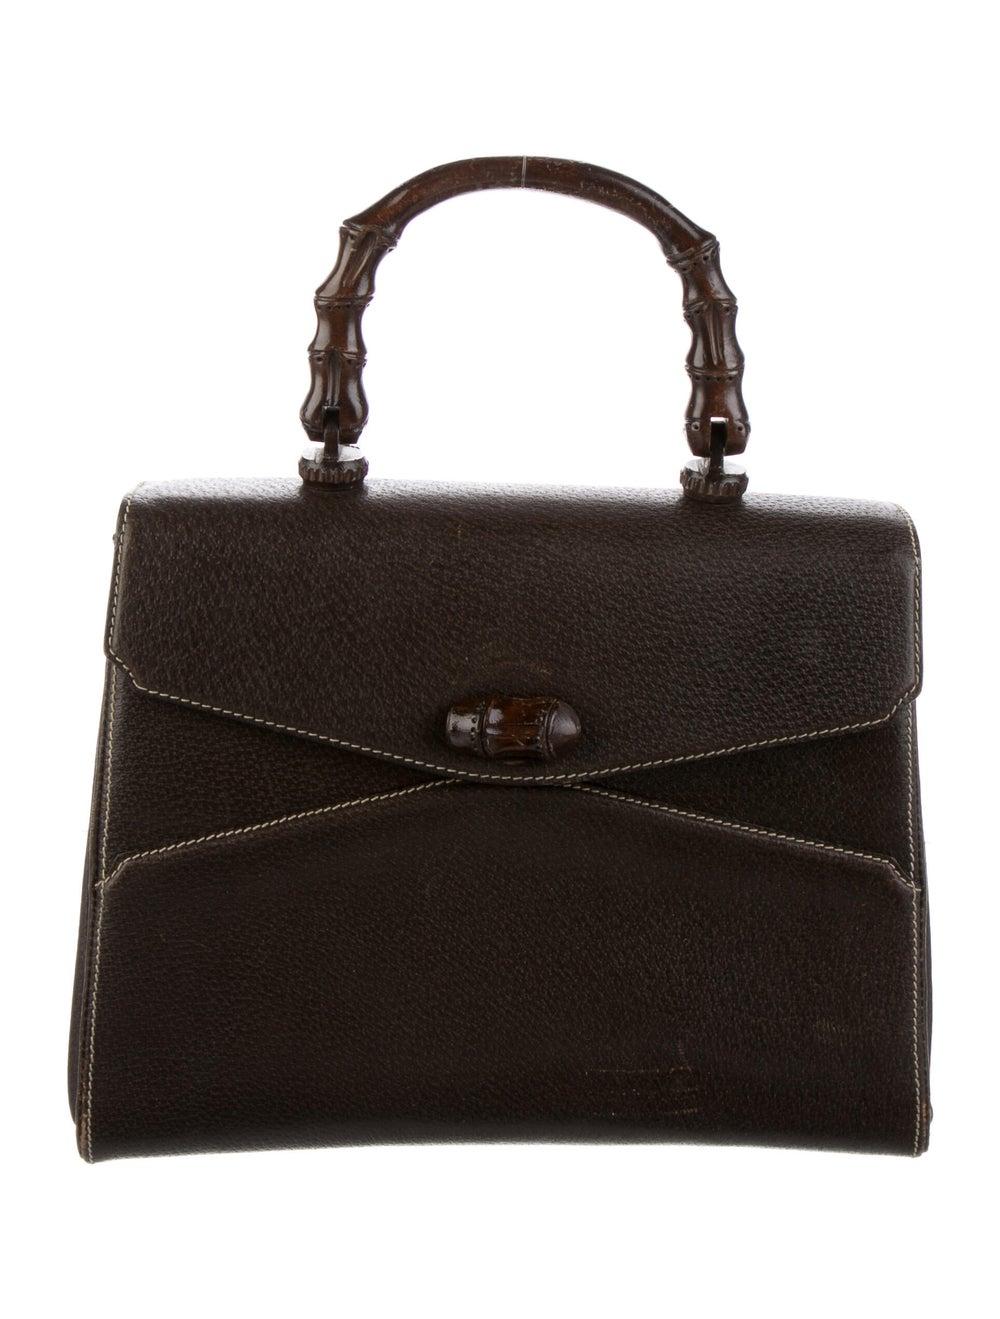 Gucci Vintage Bamboo Handle Bag Brown - image 1